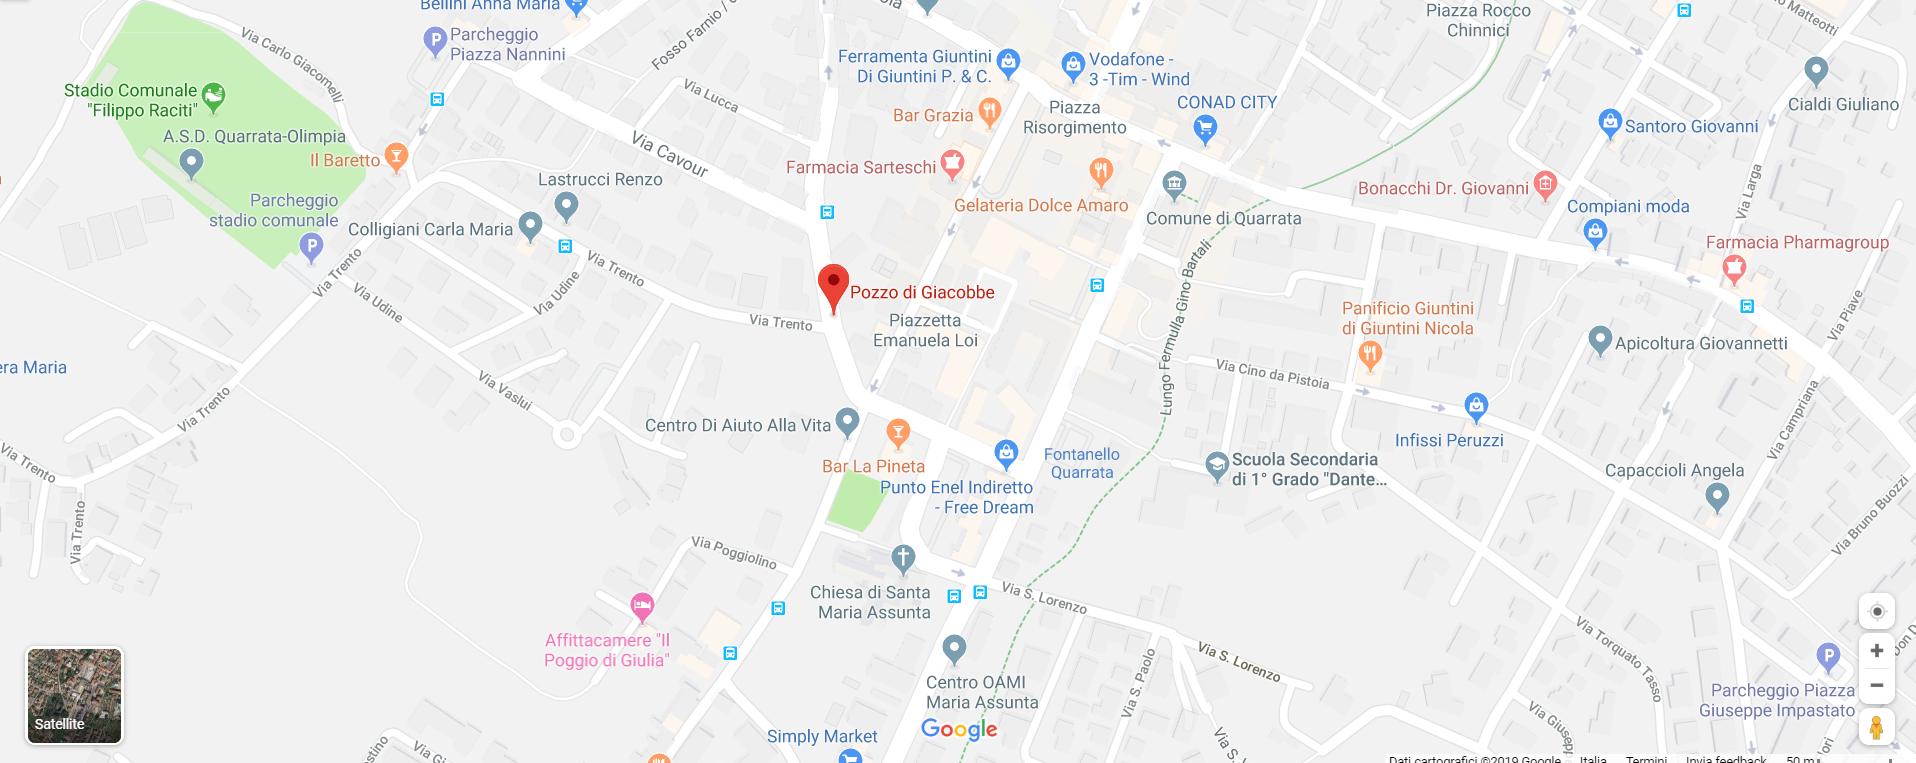 maps Pozzo di Giacobbe